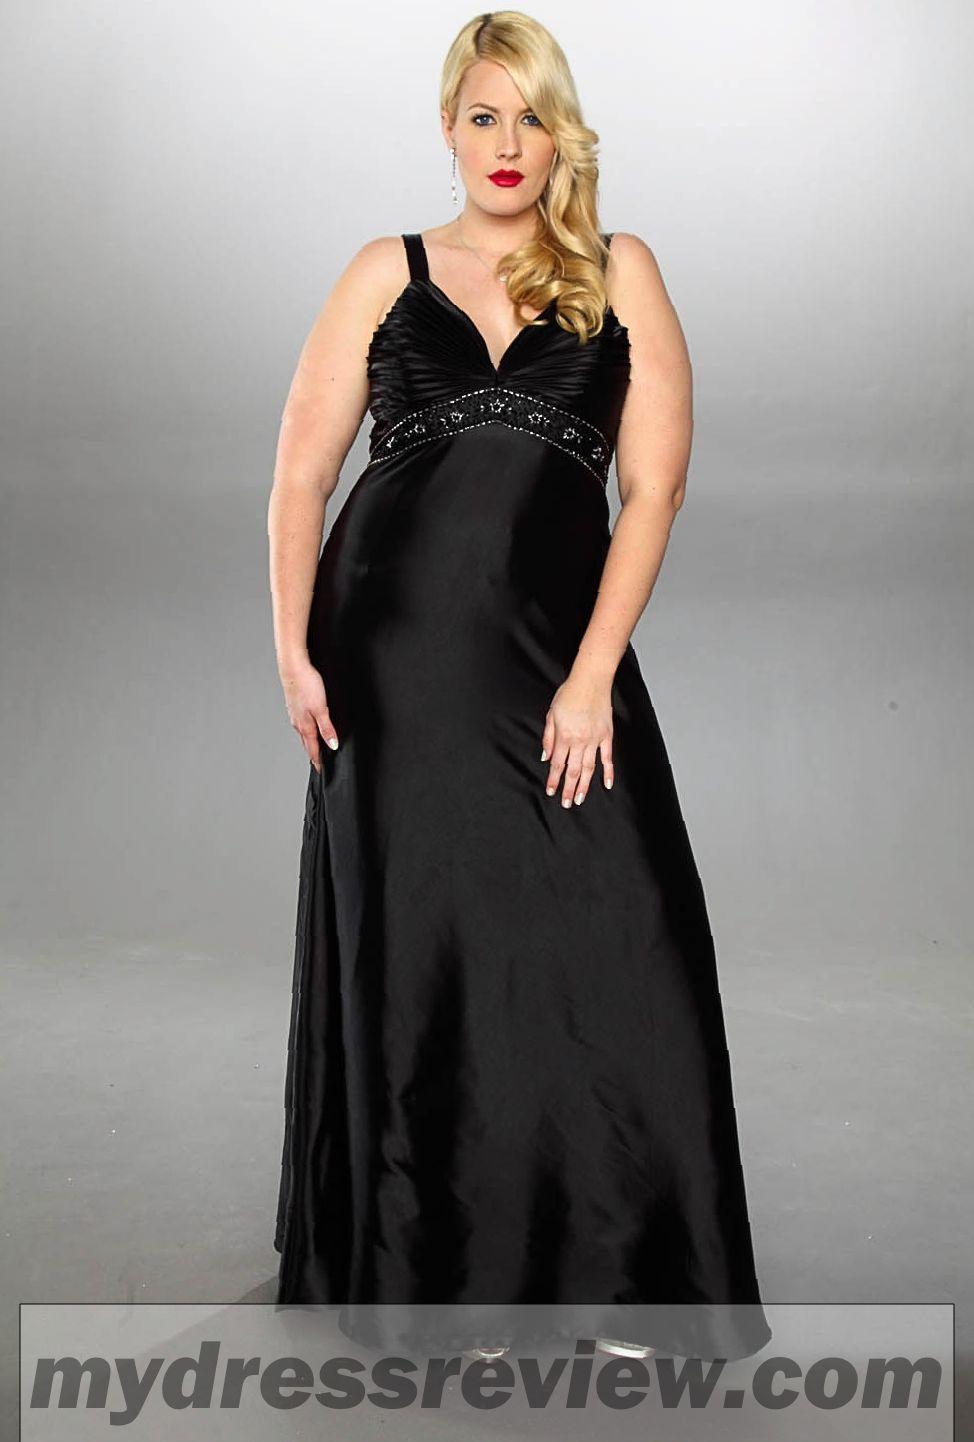 Black Dress With Jacket Plus Size Amp 2017 Fashion Trends